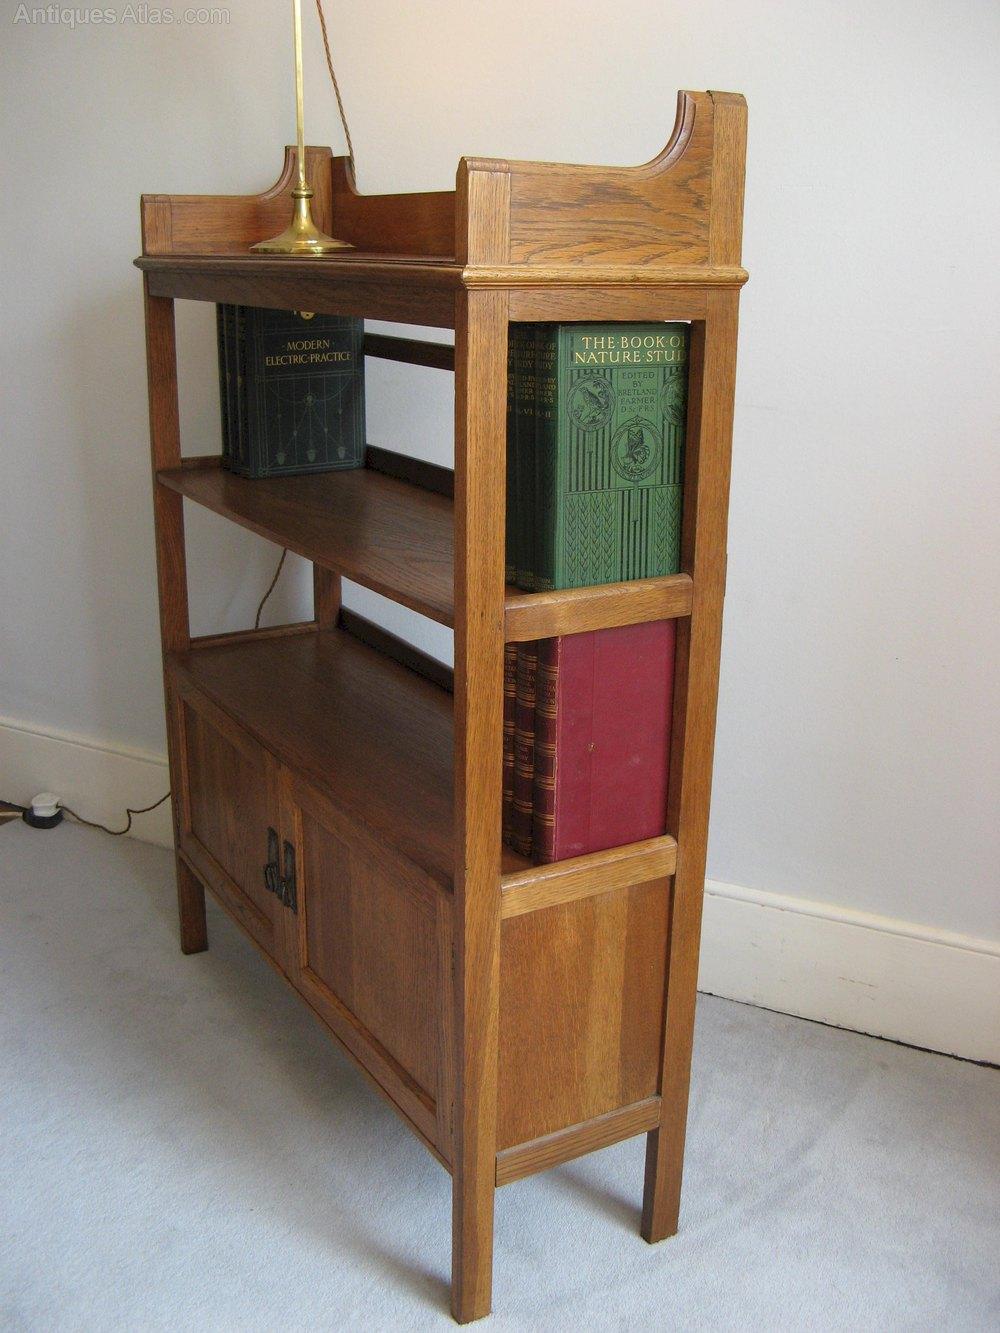 oak antique additional fine victorian shelves from overtones bookcase images white antiques mahogany p bookshelf